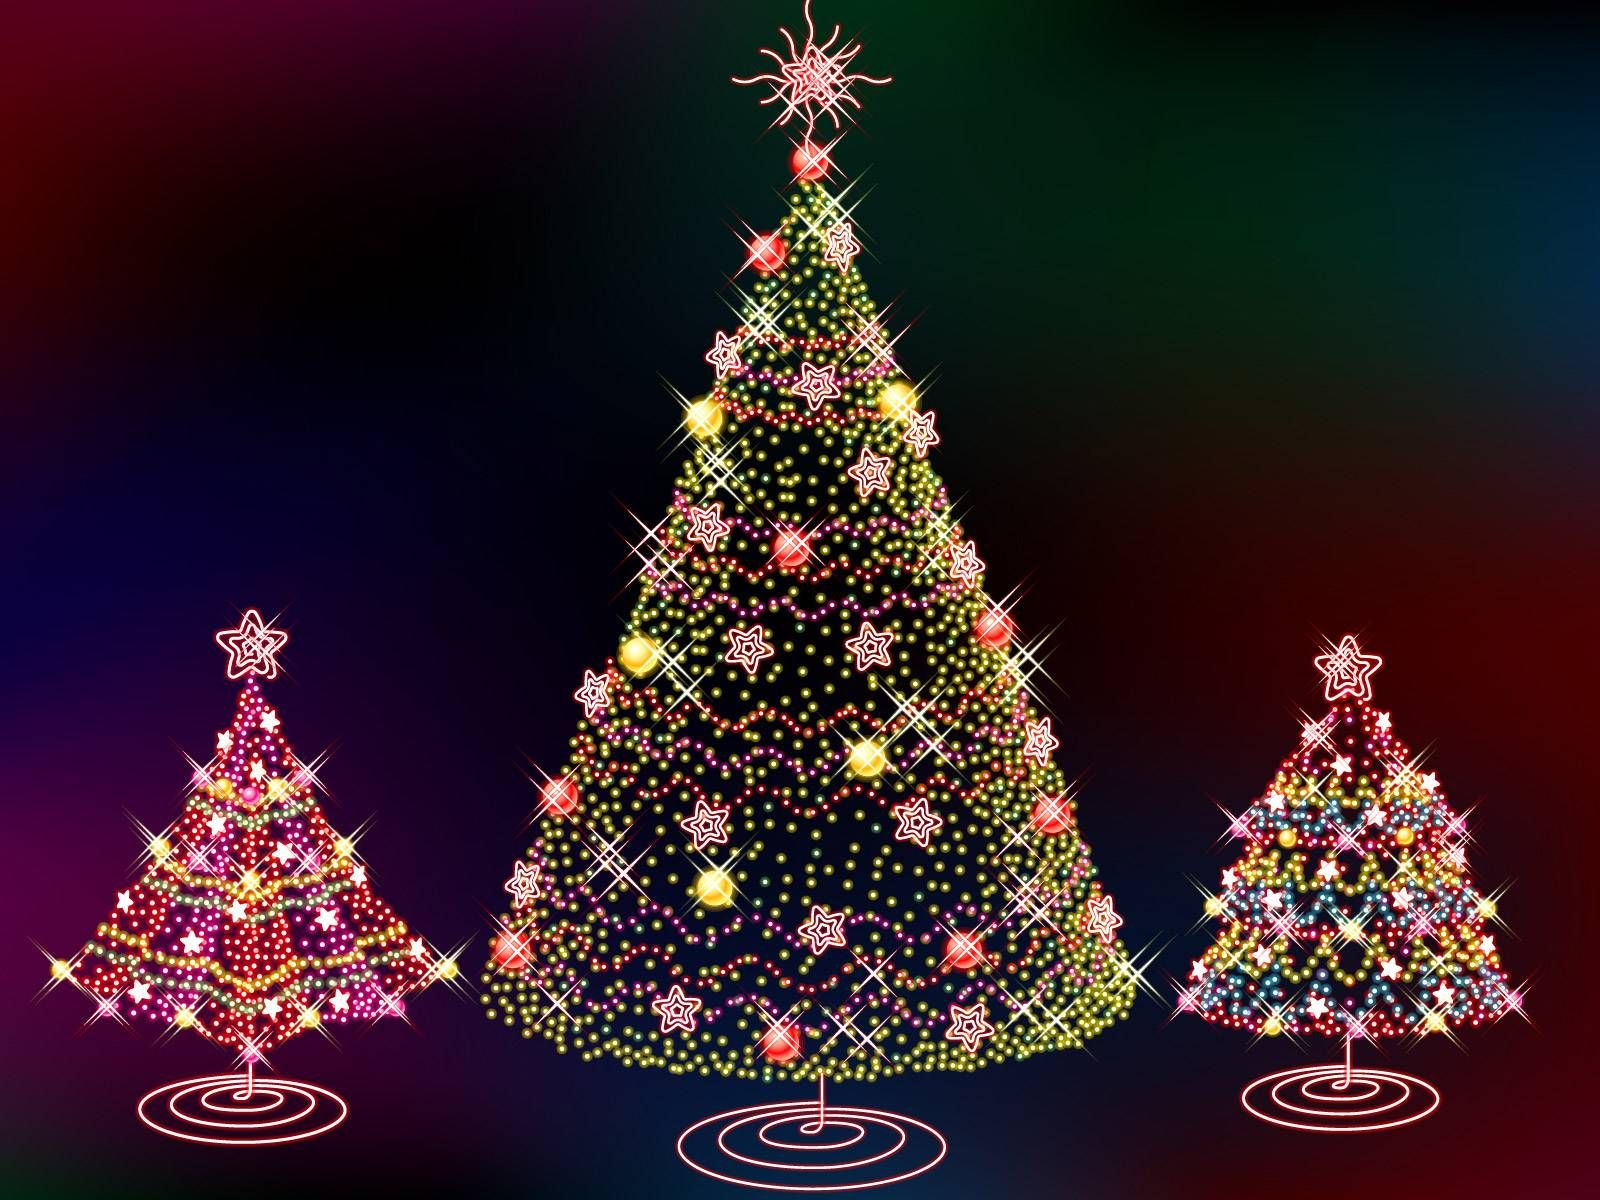 Beautiful Christmas Pictures For Desktop Animated Models Swimsuit Christmas Deskto Christmas Desktop Wallpaper Christmas Desktop Christmas Tree Wallpaper